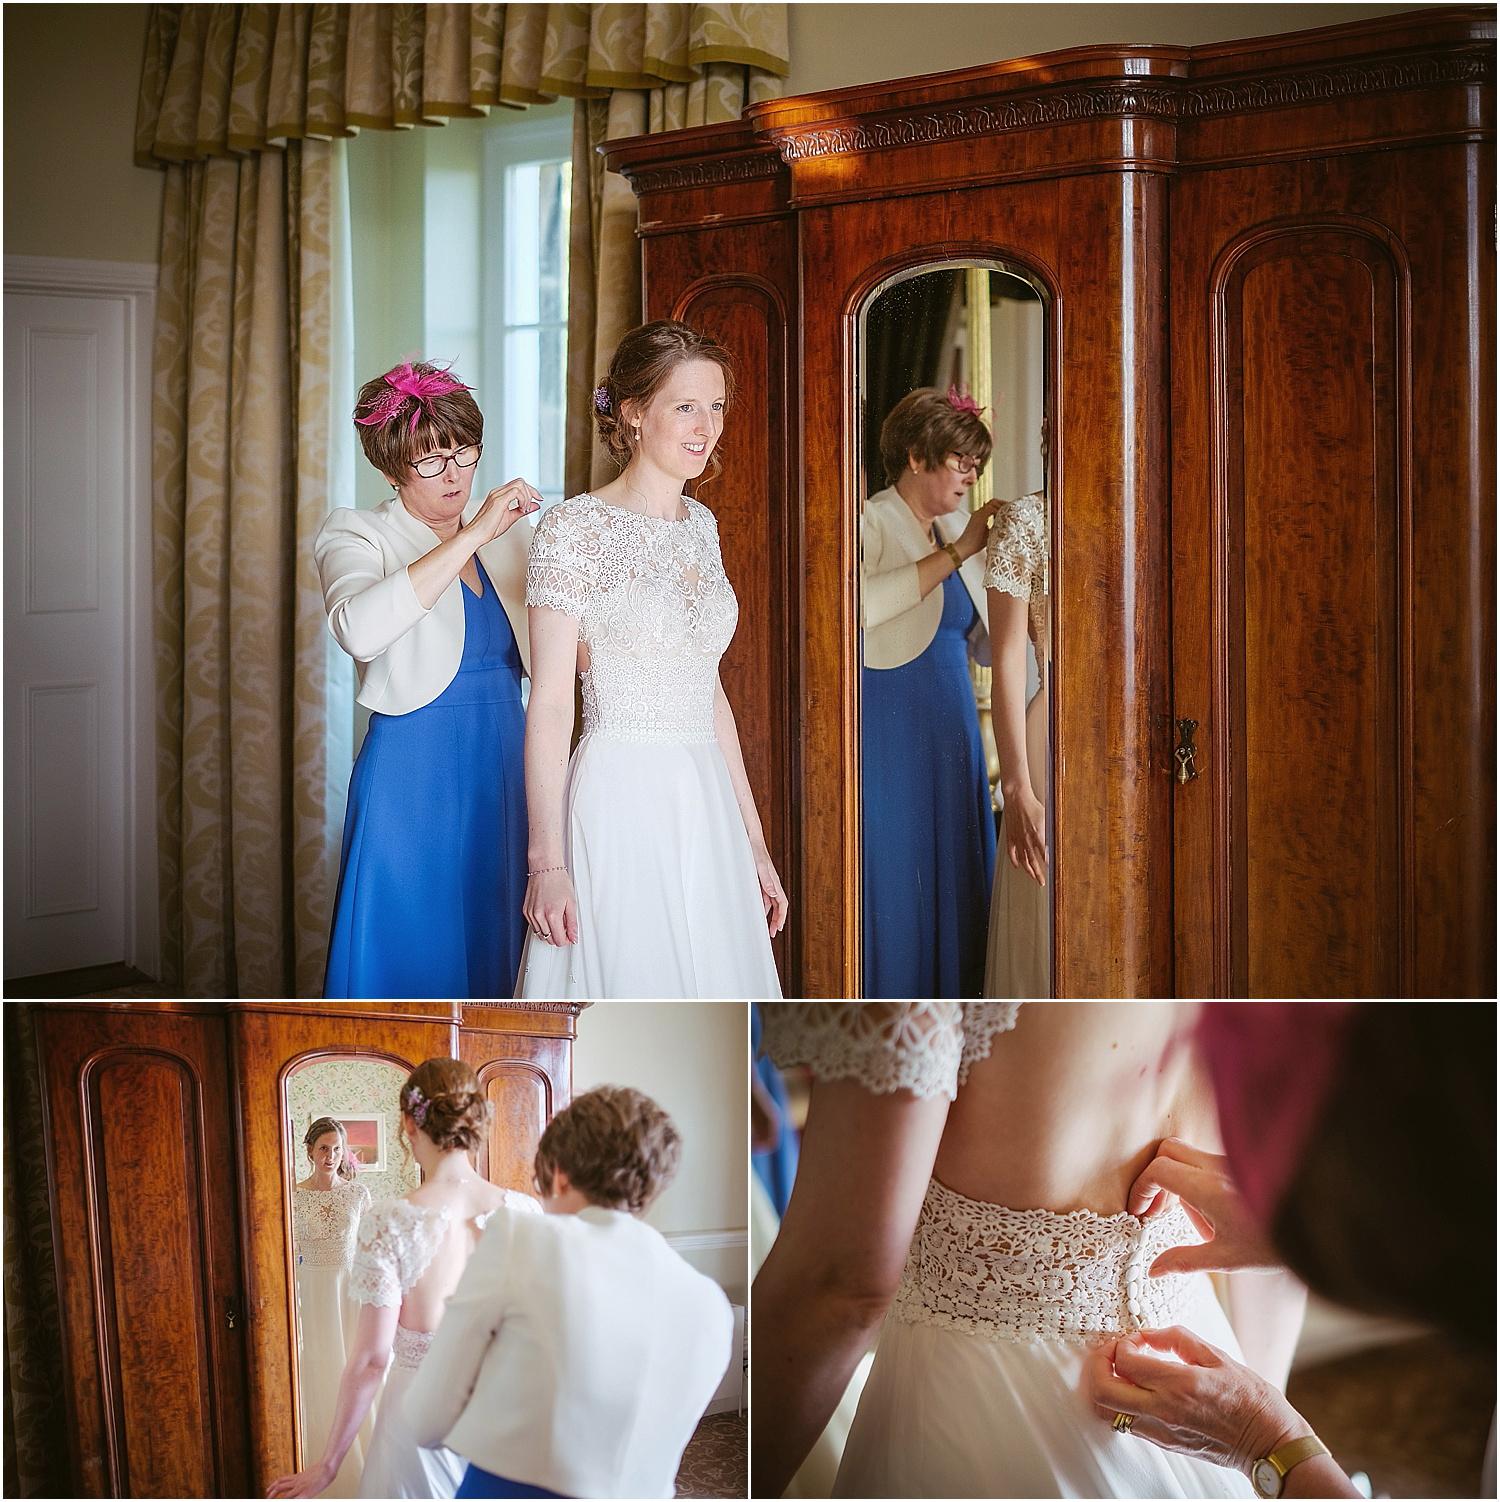 Wedding photos at Matfen Hall 005.jpg